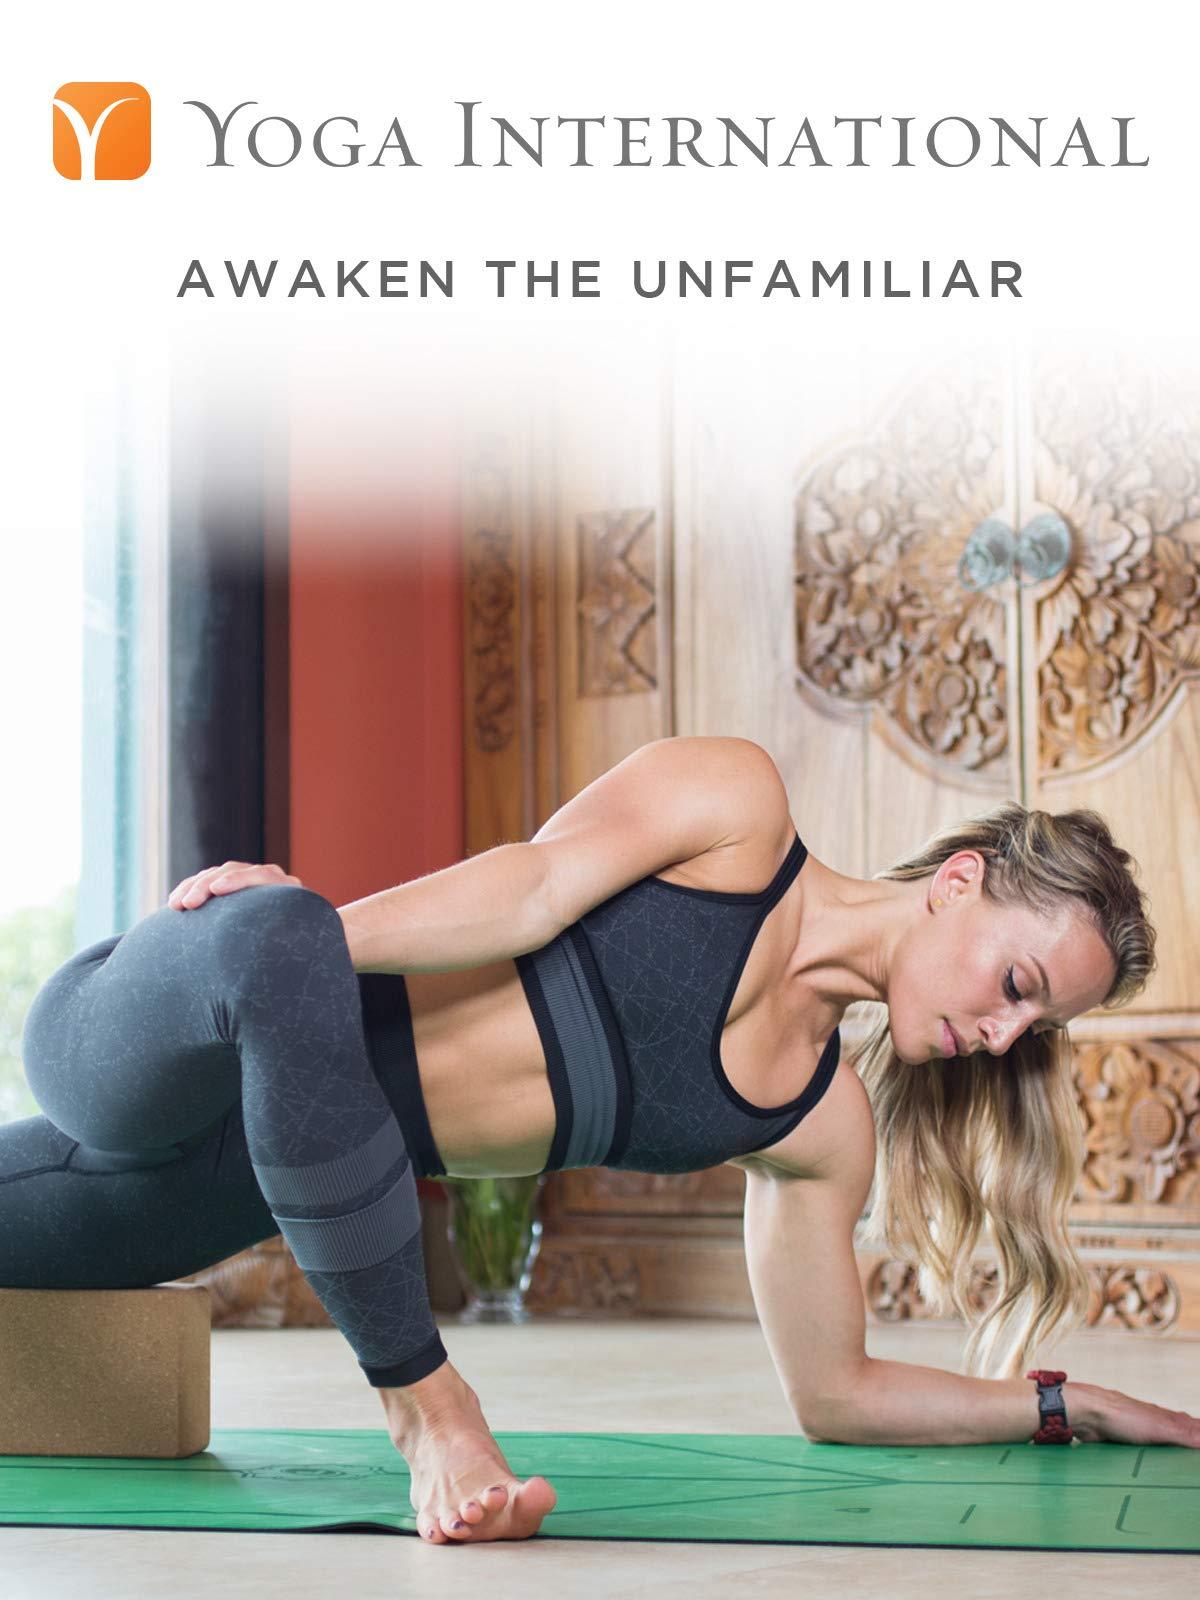 Awaken the Unfamiliar